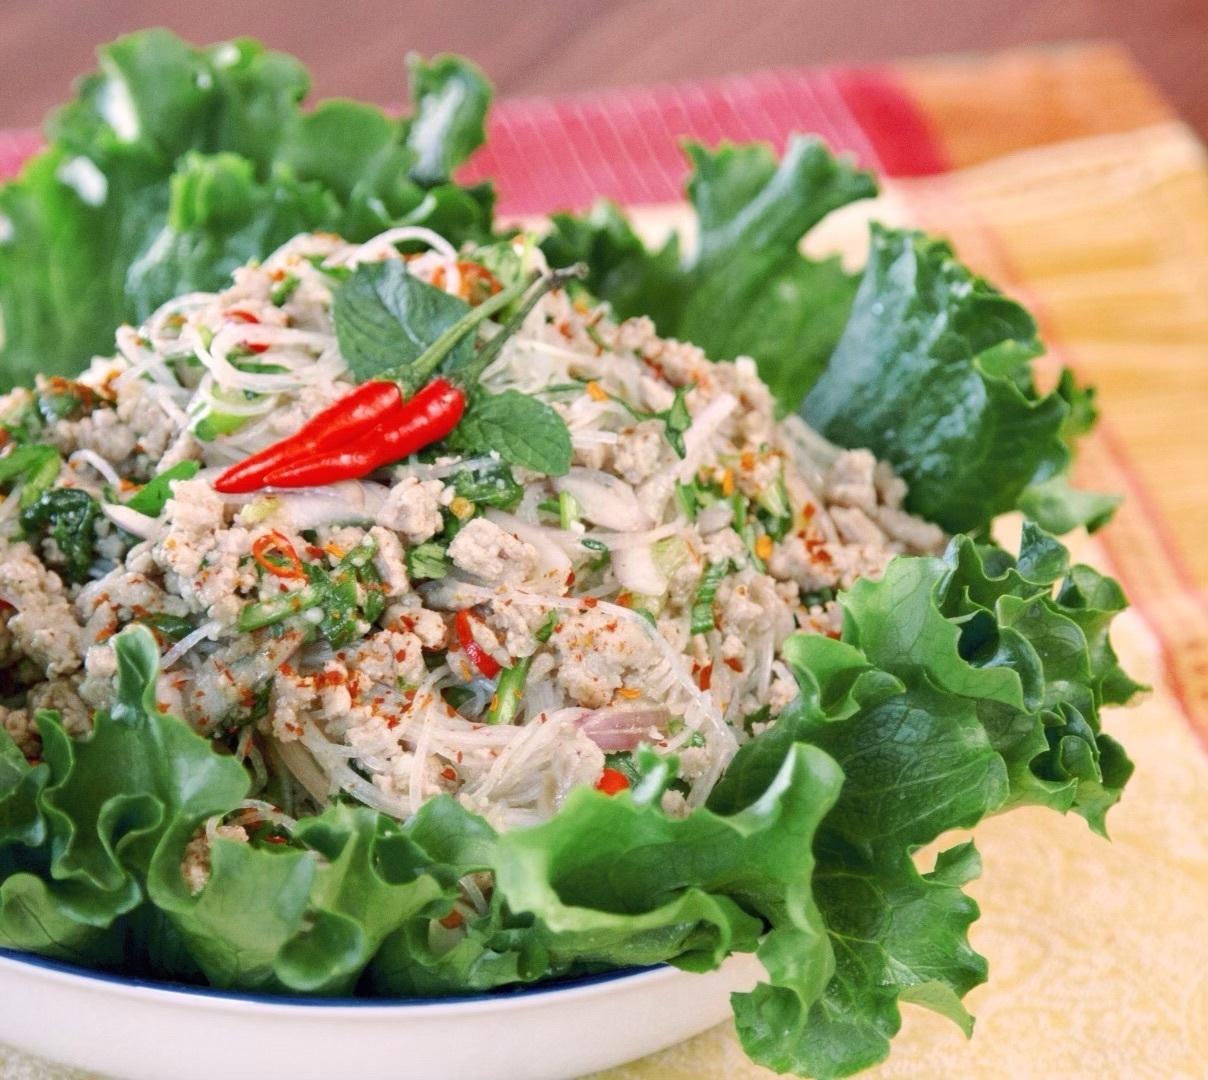 Острый тайский салат с фунчозой Laab Woonsen